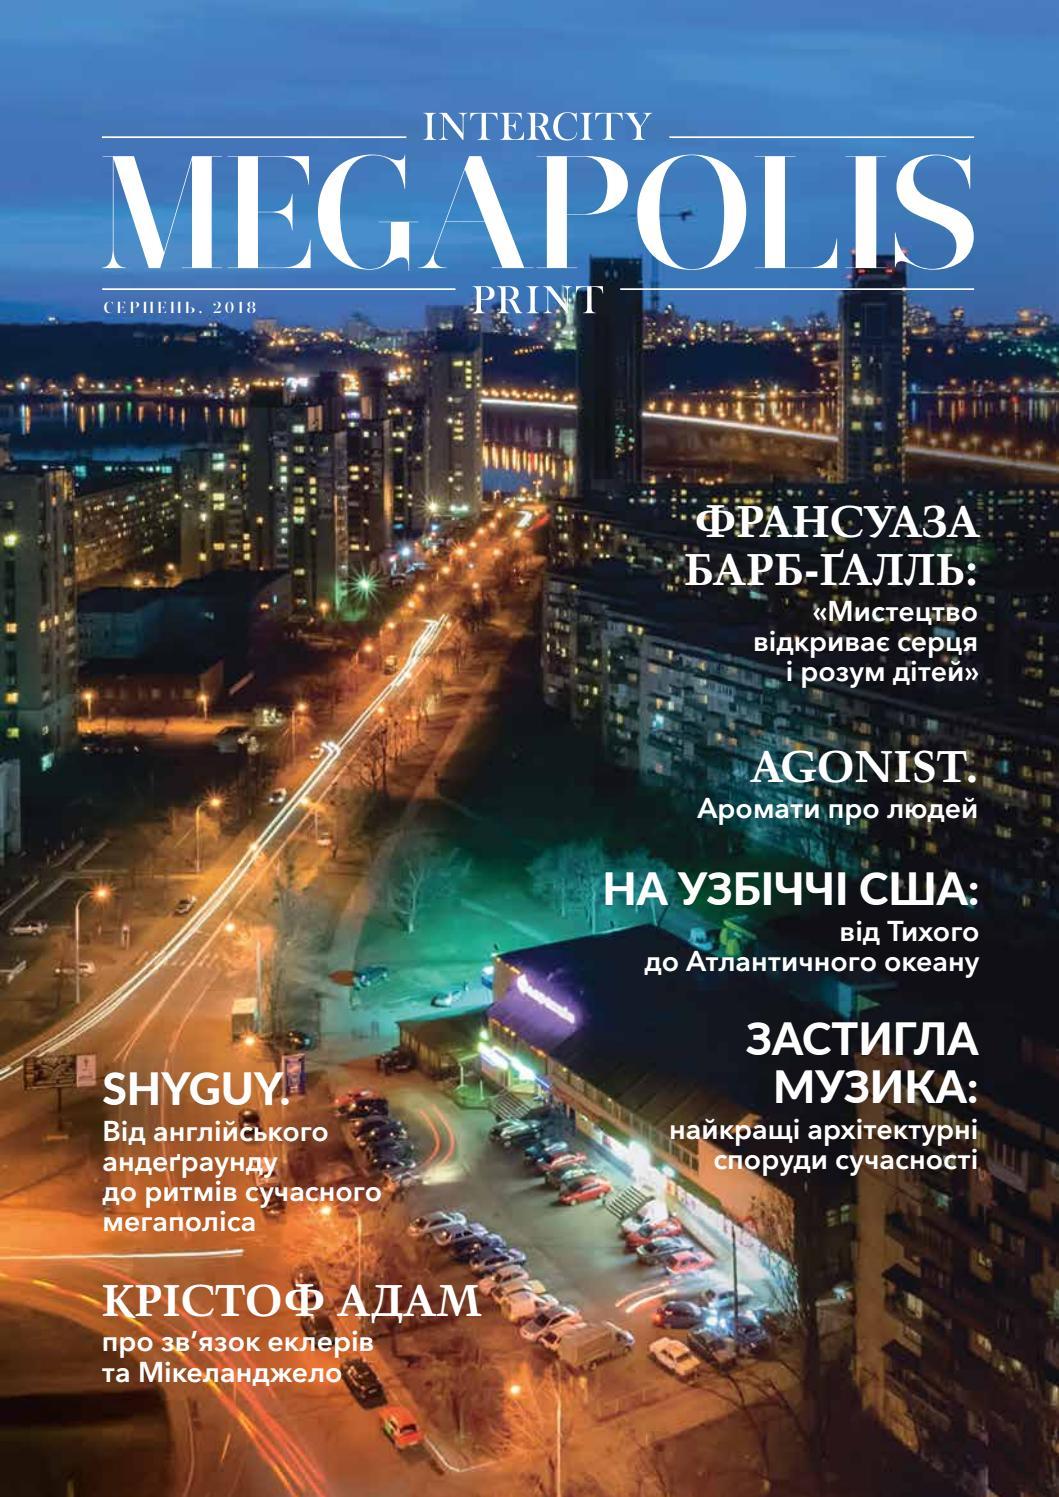 dfb593b24d2c50 Intercity_Megapolis_Print_August_18 by Intercity Onboard Magazine - issuu